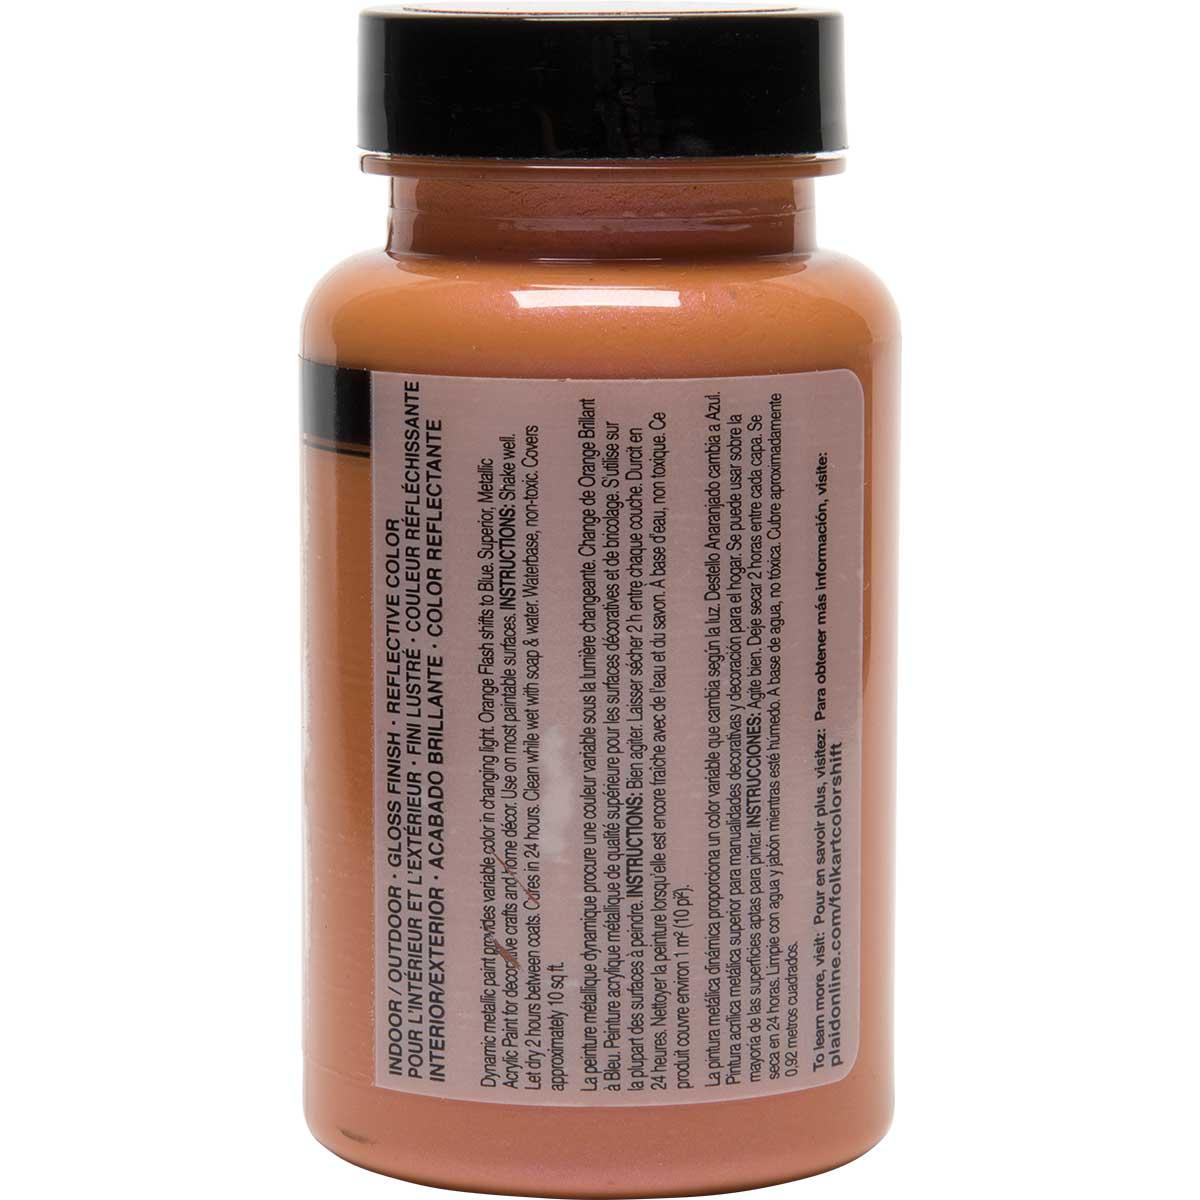 FolkArt ® Color Shift™ Acrylic Paint - Orange Flash, 4 oz.